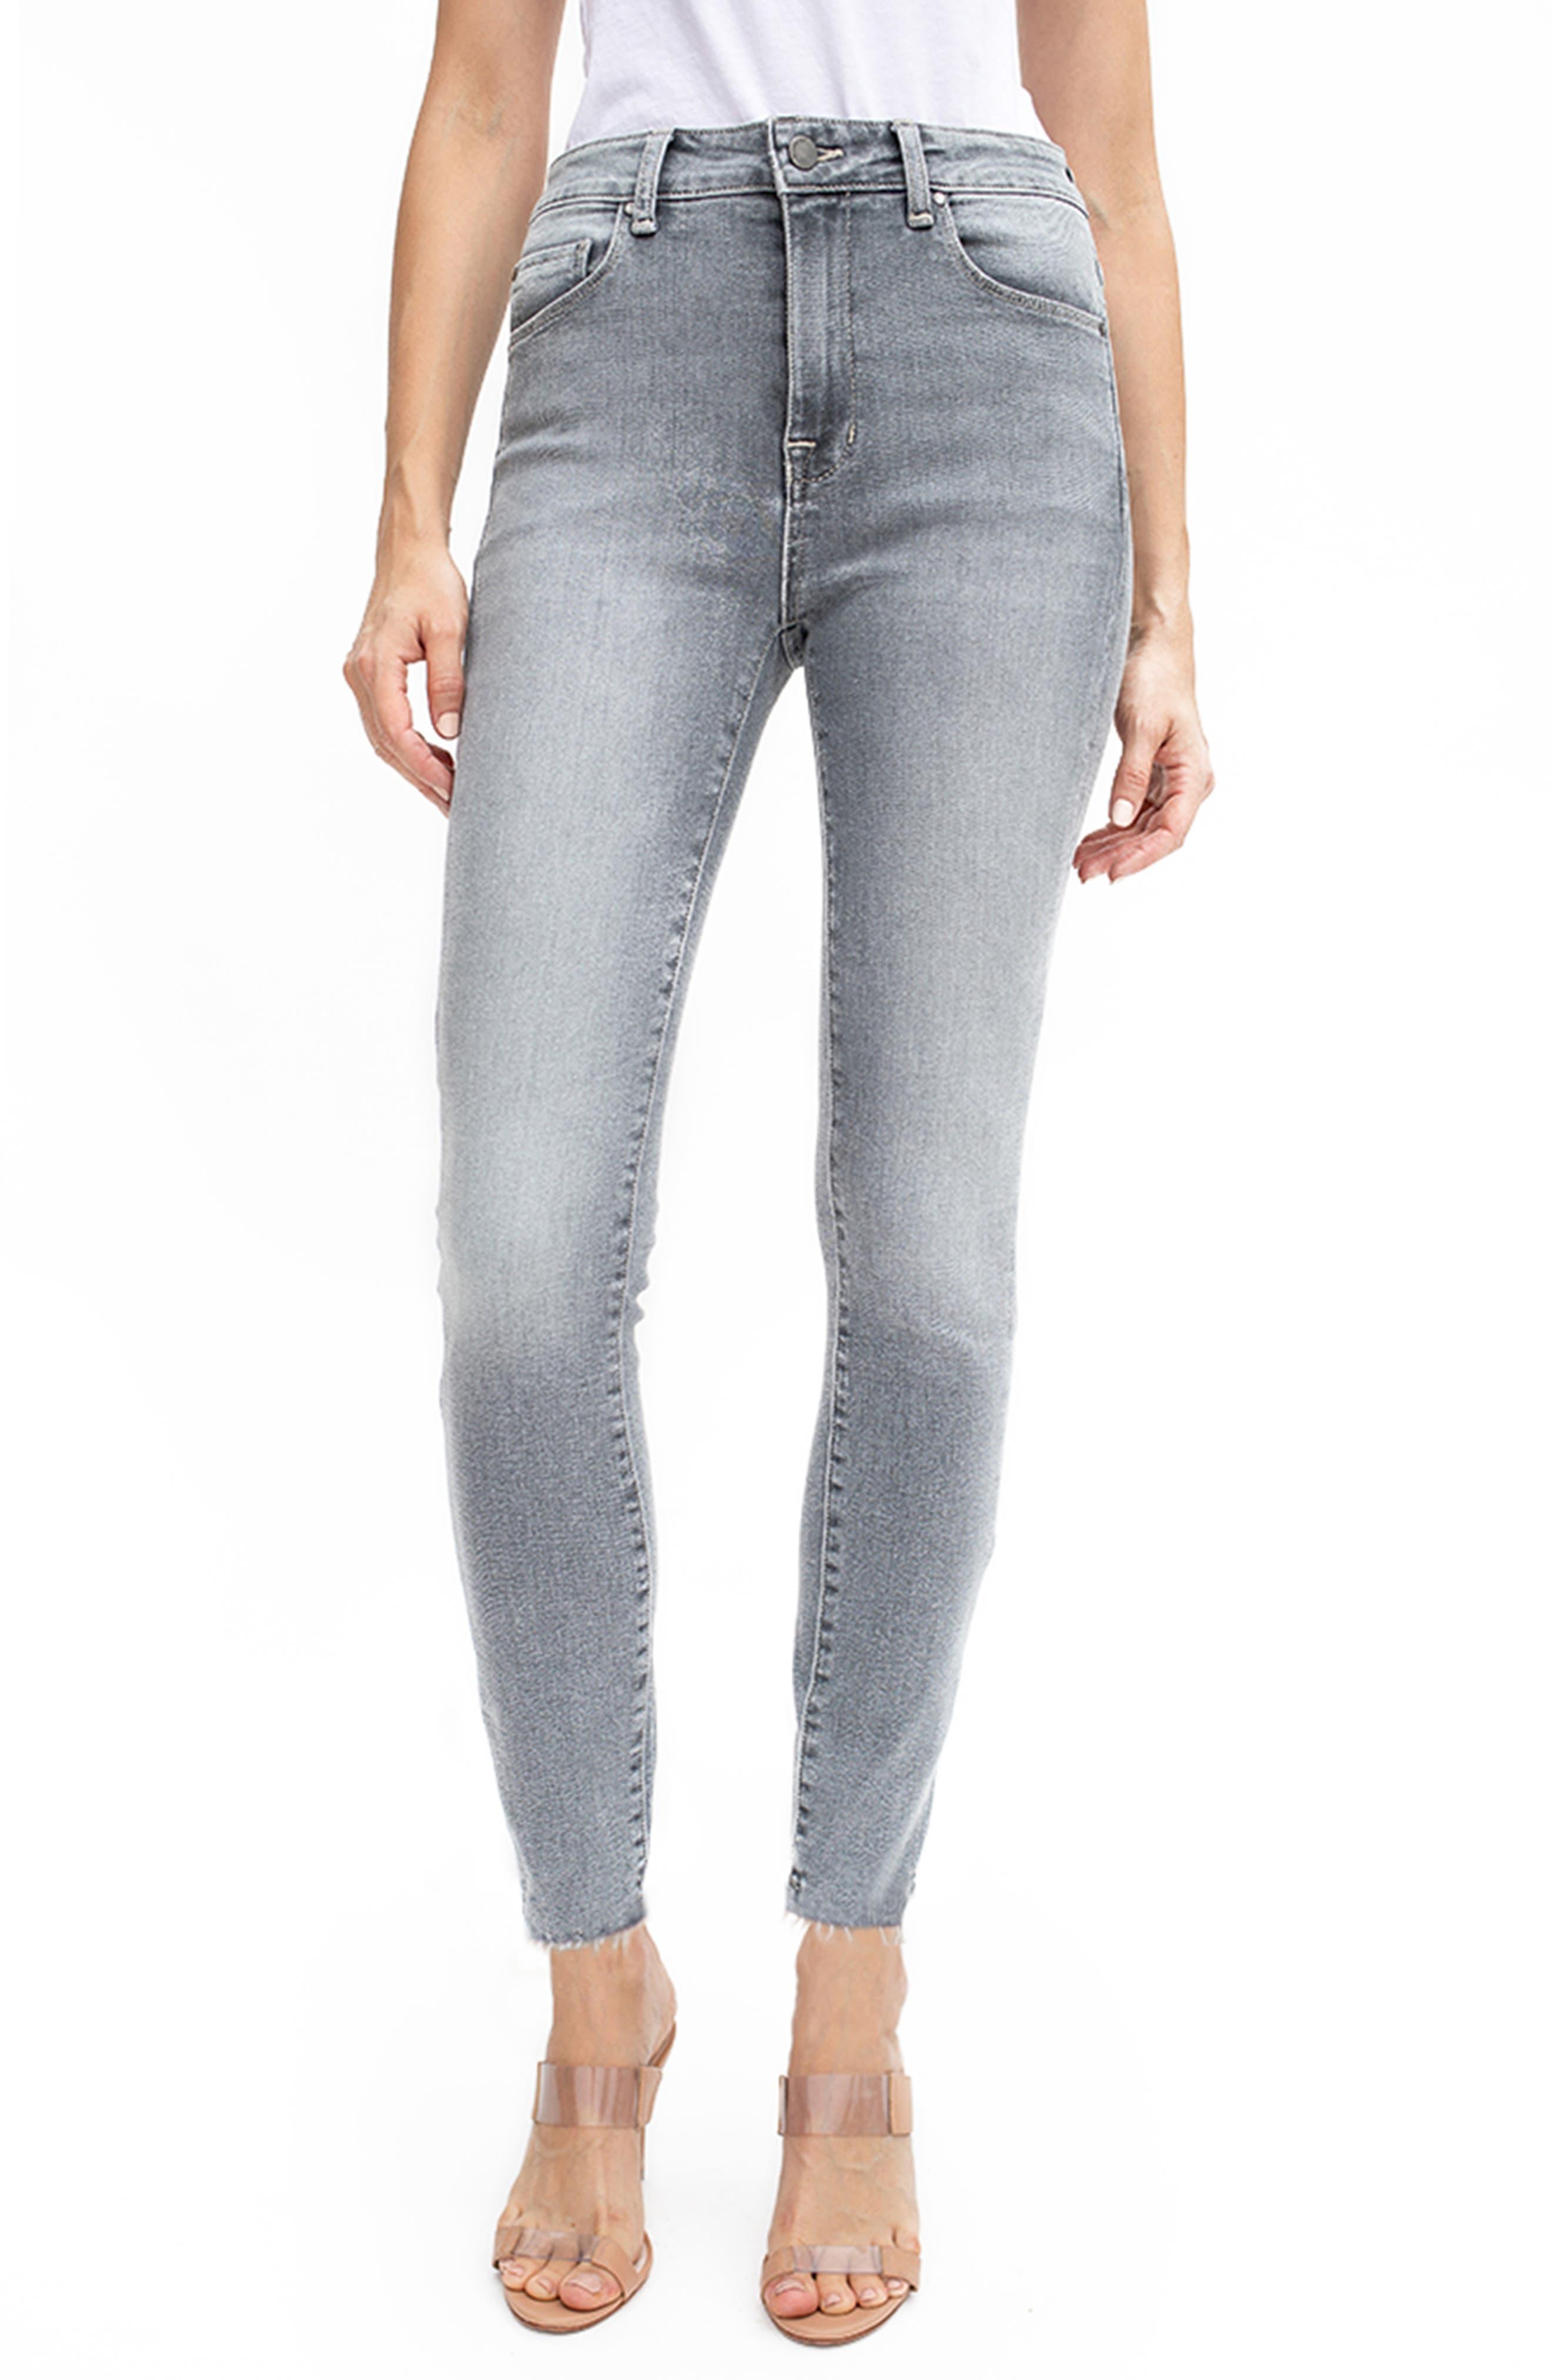 Gwen High Waist Raw Hem Ankle Skinny Jeans